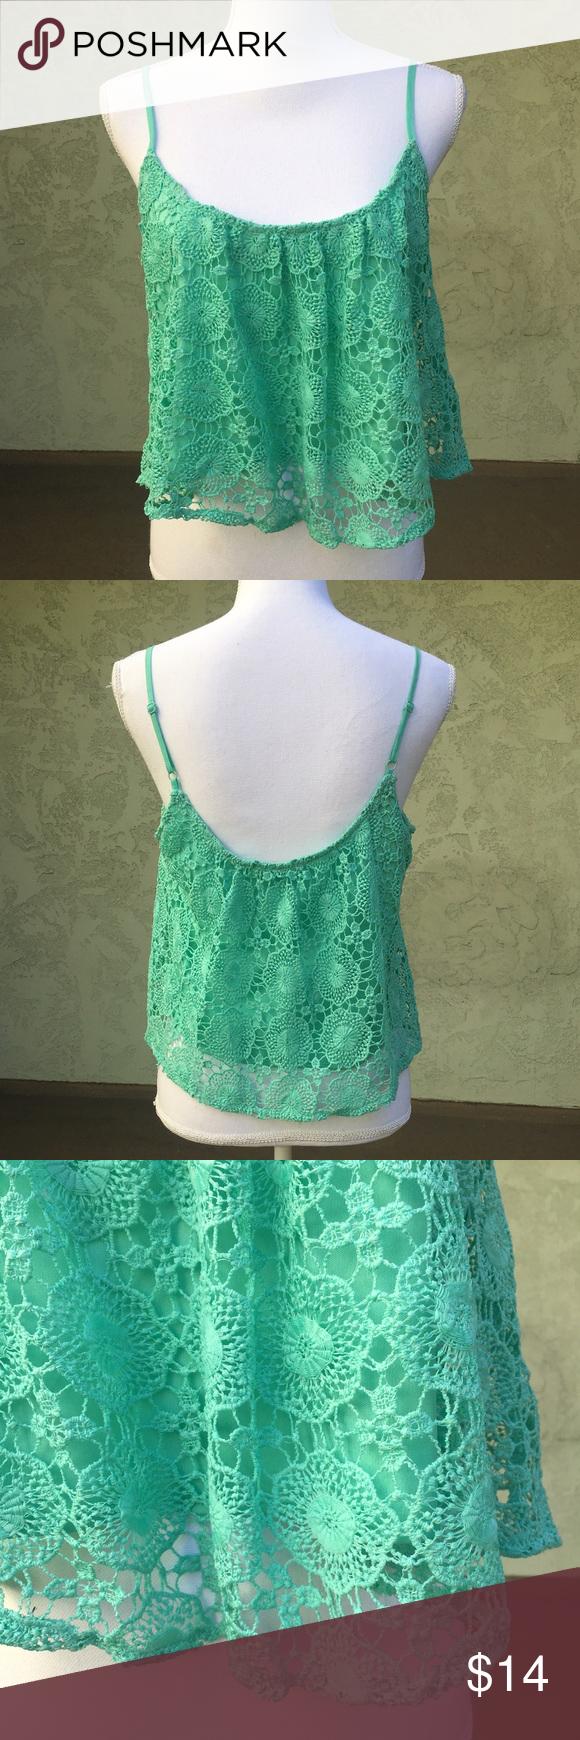 LA Hearts Women's Crop Tank Lace Green Size Large Pastel green Lace Top. Size Large. Flowy. Adjustable straps LA Hearts Tops Crop Tops